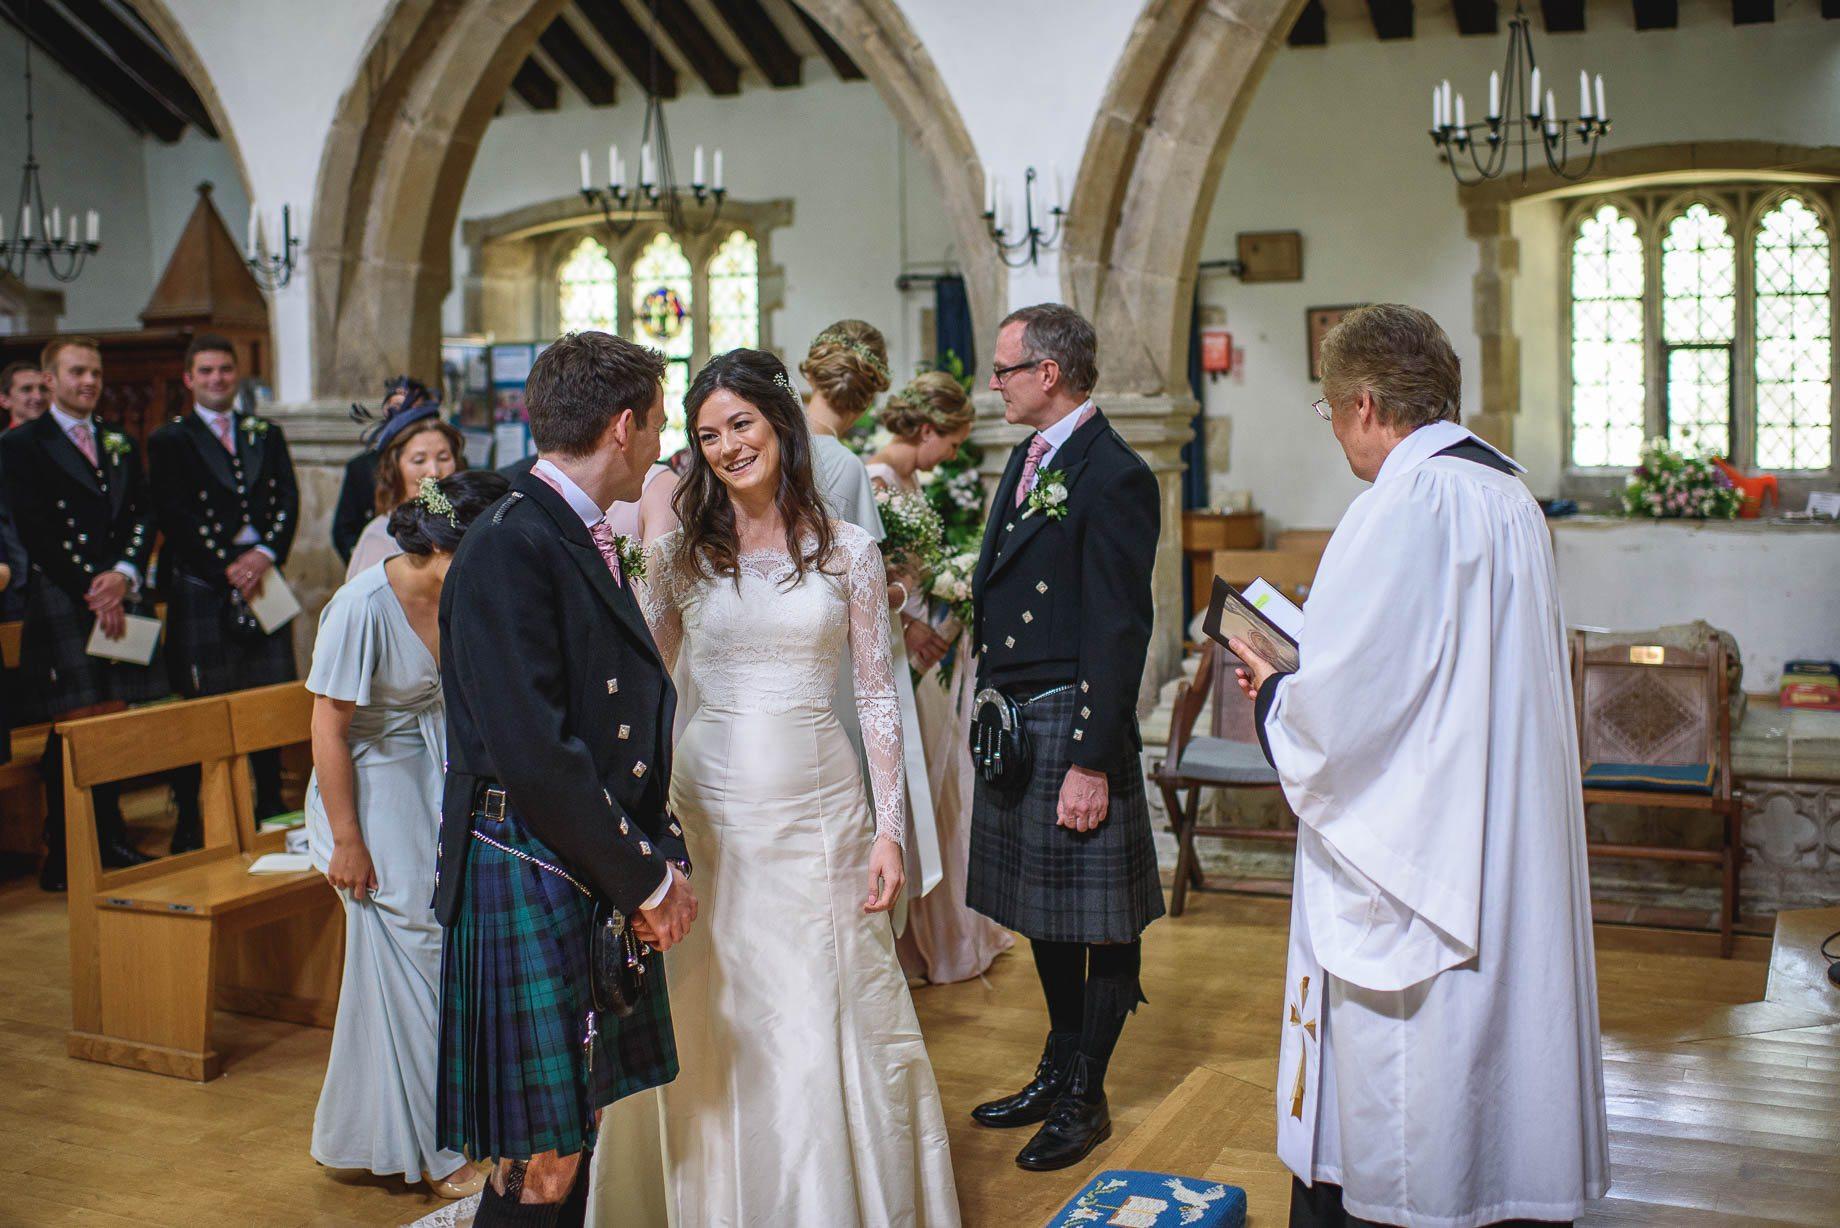 Gildings Barn wedding photography - Sarah and Steve (48 of 190)